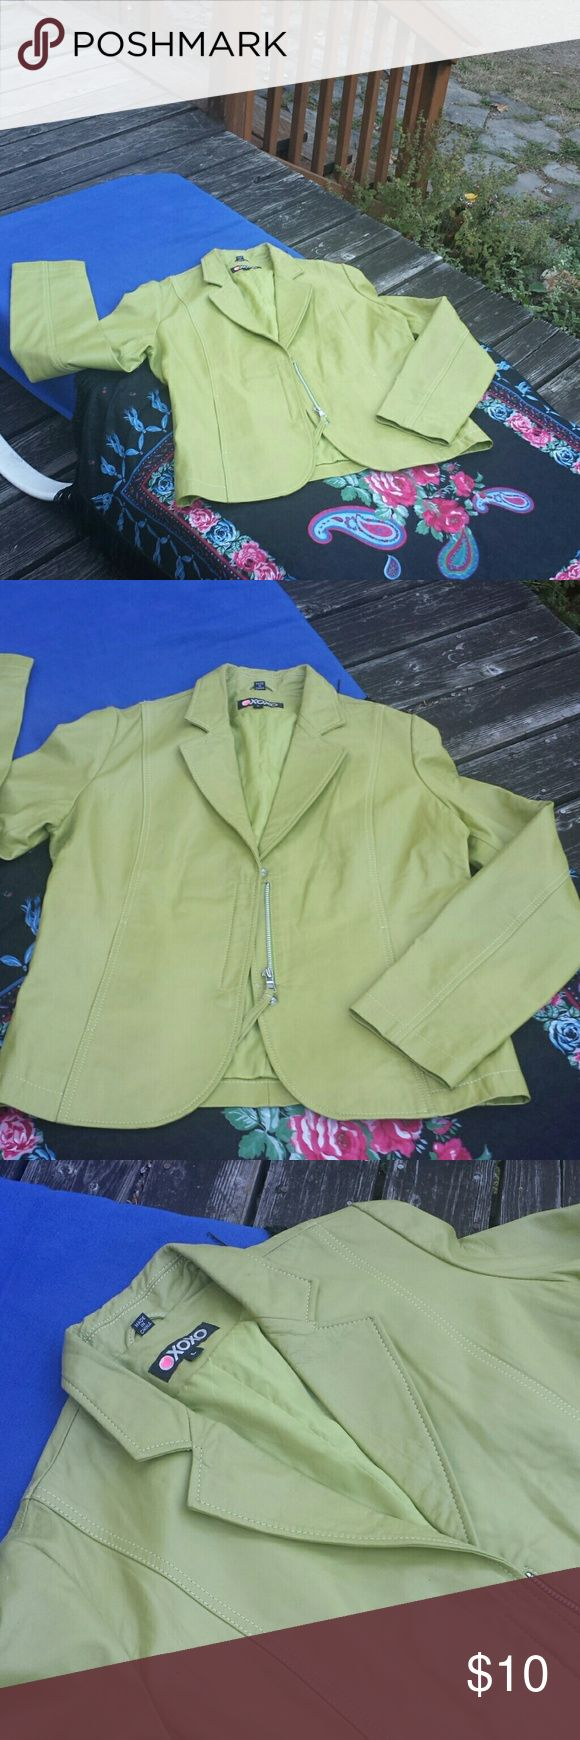 Large green leather jacket XOXO 1970s green..blazer style leather jacket..lined..pockets..zip front..sone wear but cute nonetheless XOXO Jackets & Coats Blazers